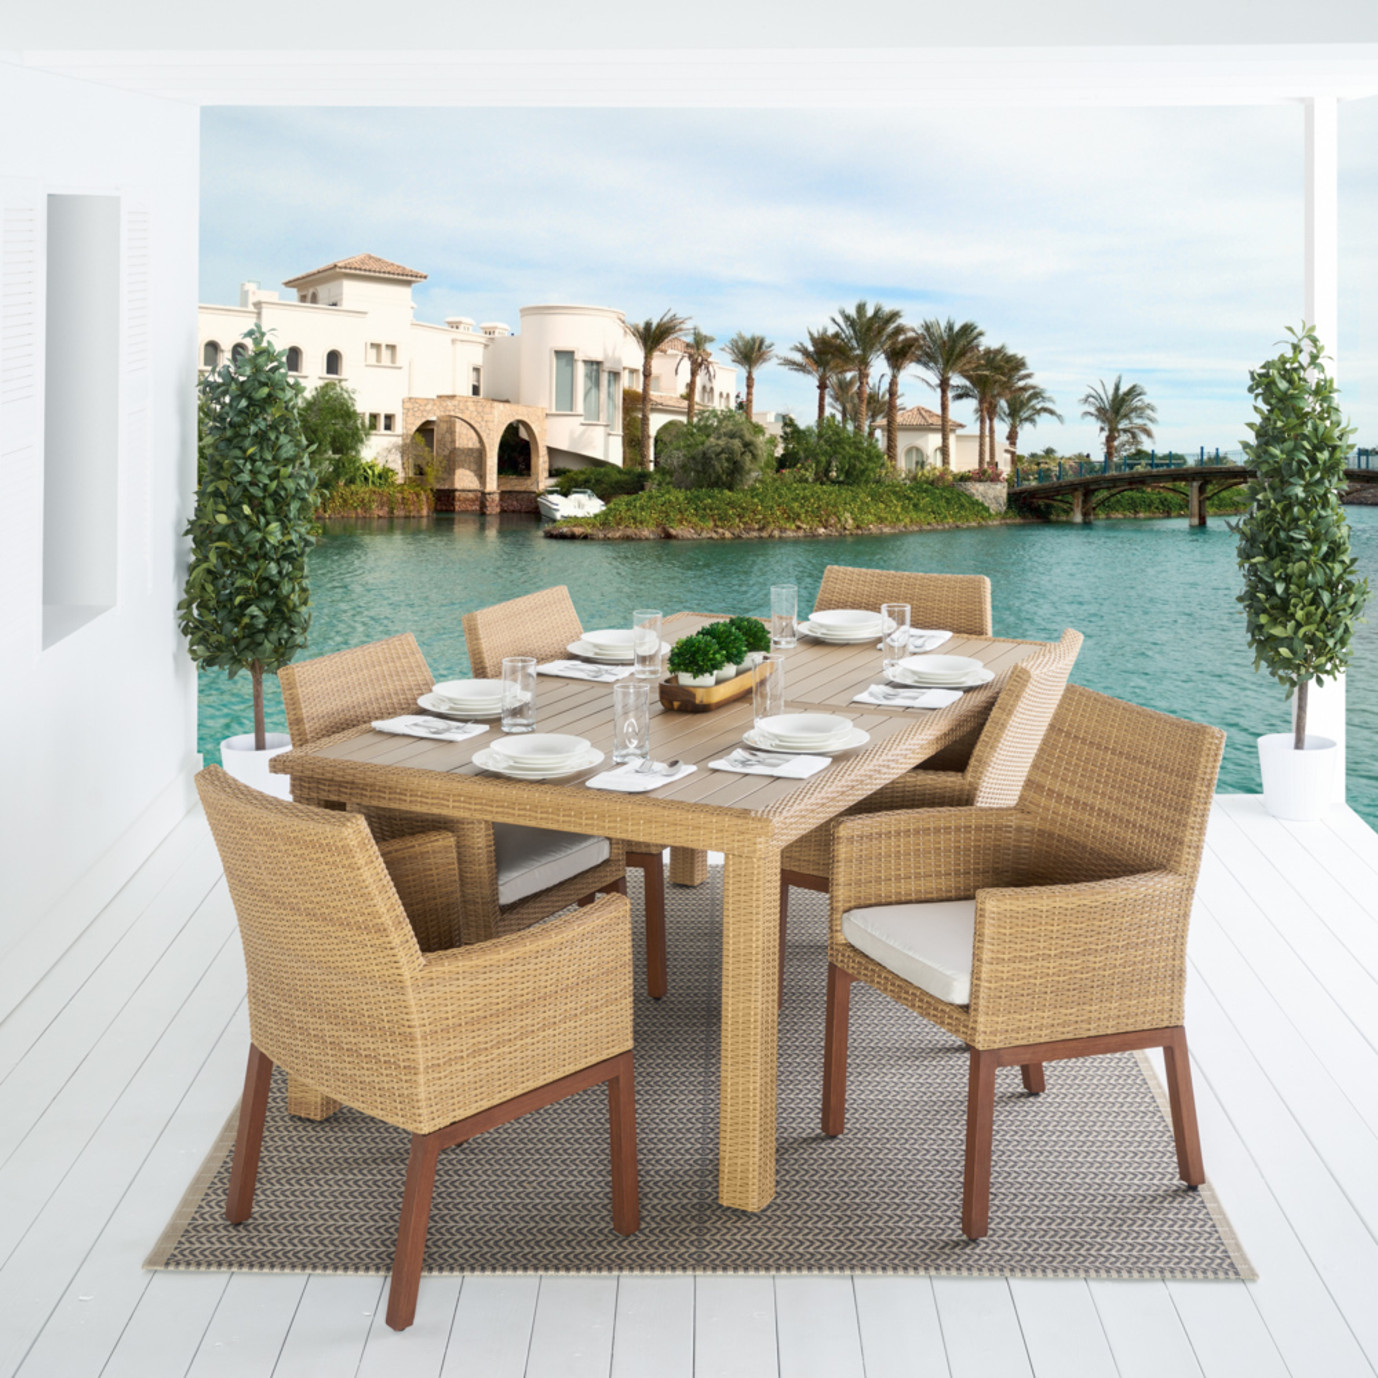 Mili™ 7 Piece Dining Set - Moroccan Cream